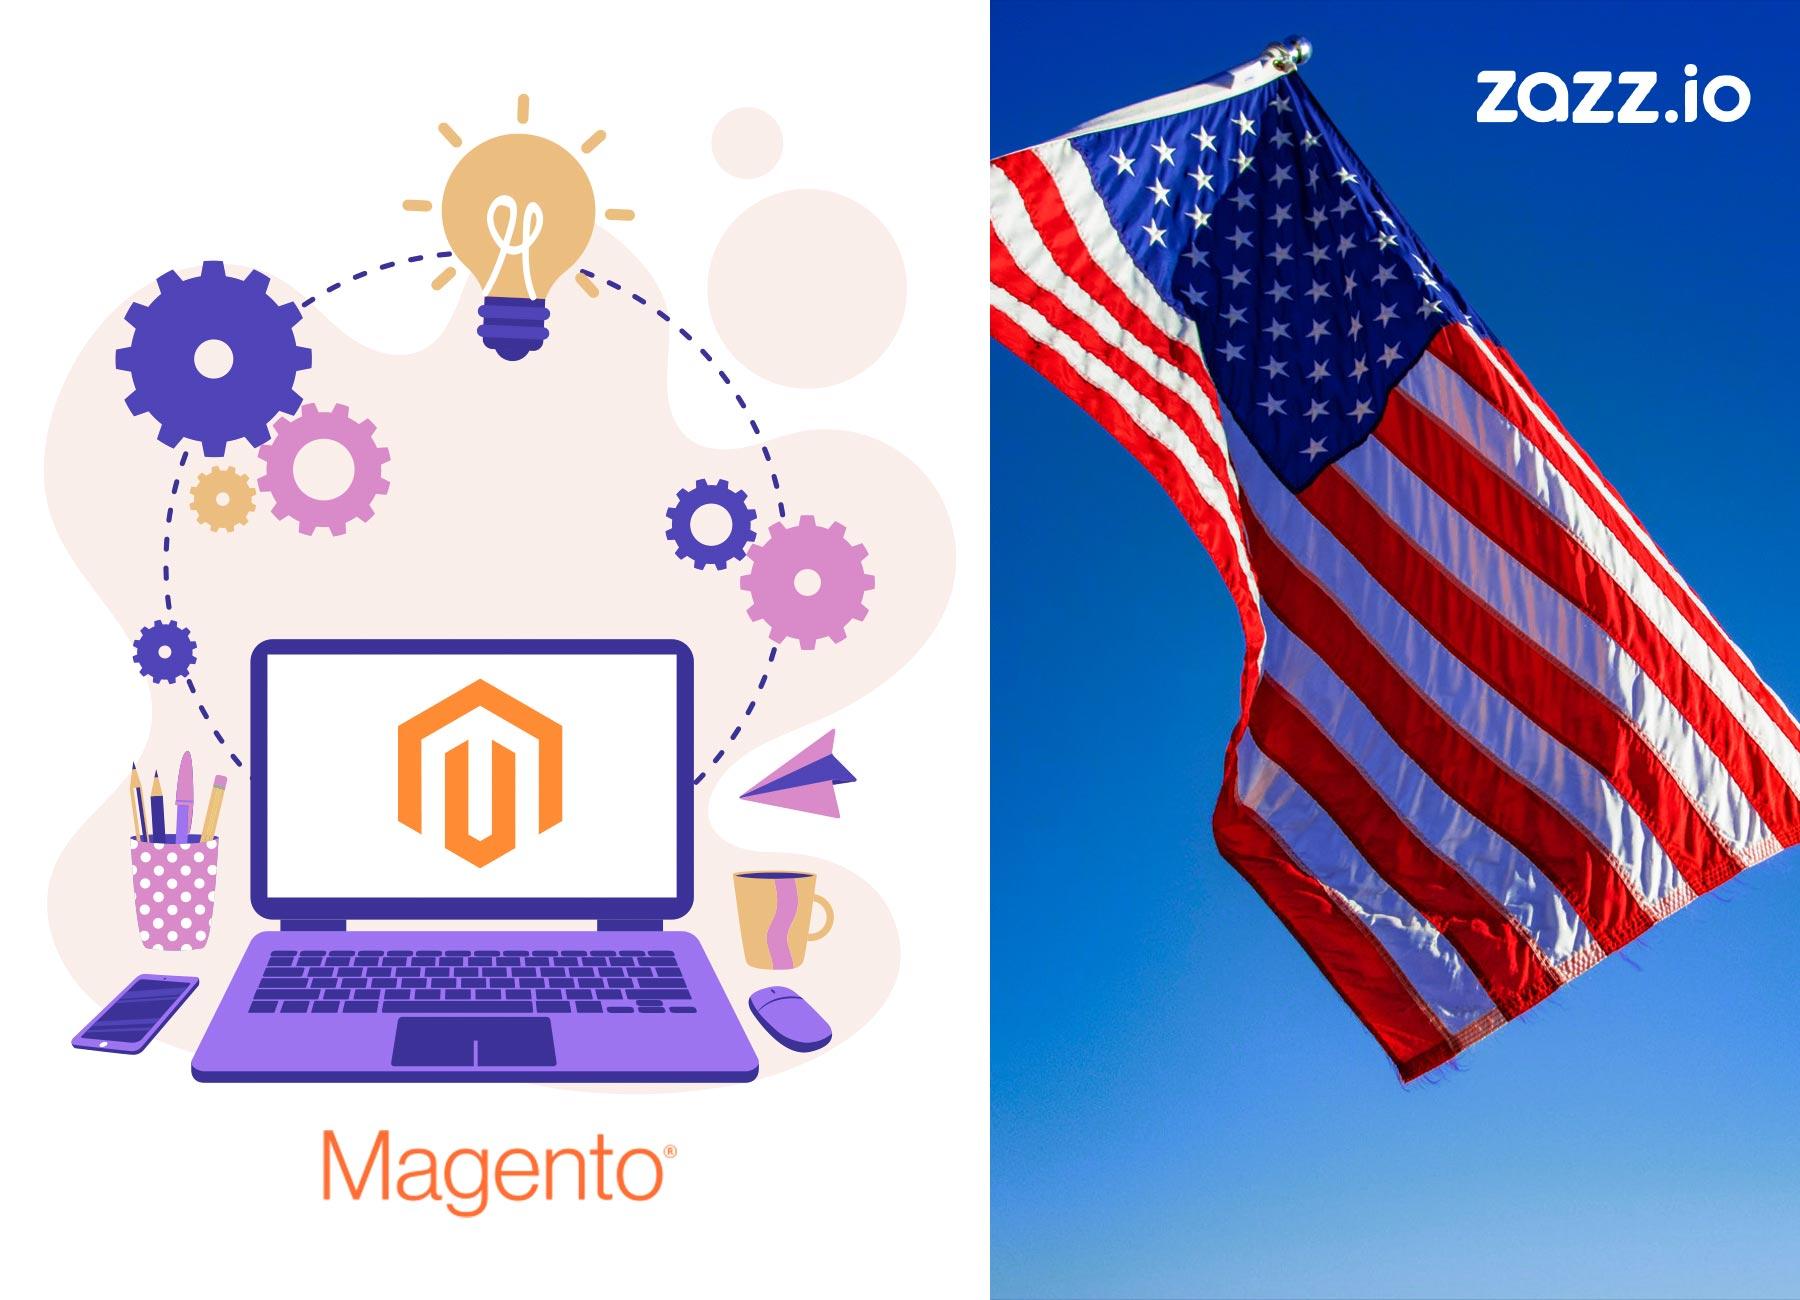 Award Winning Top 10 Magento Development Companies In The USA